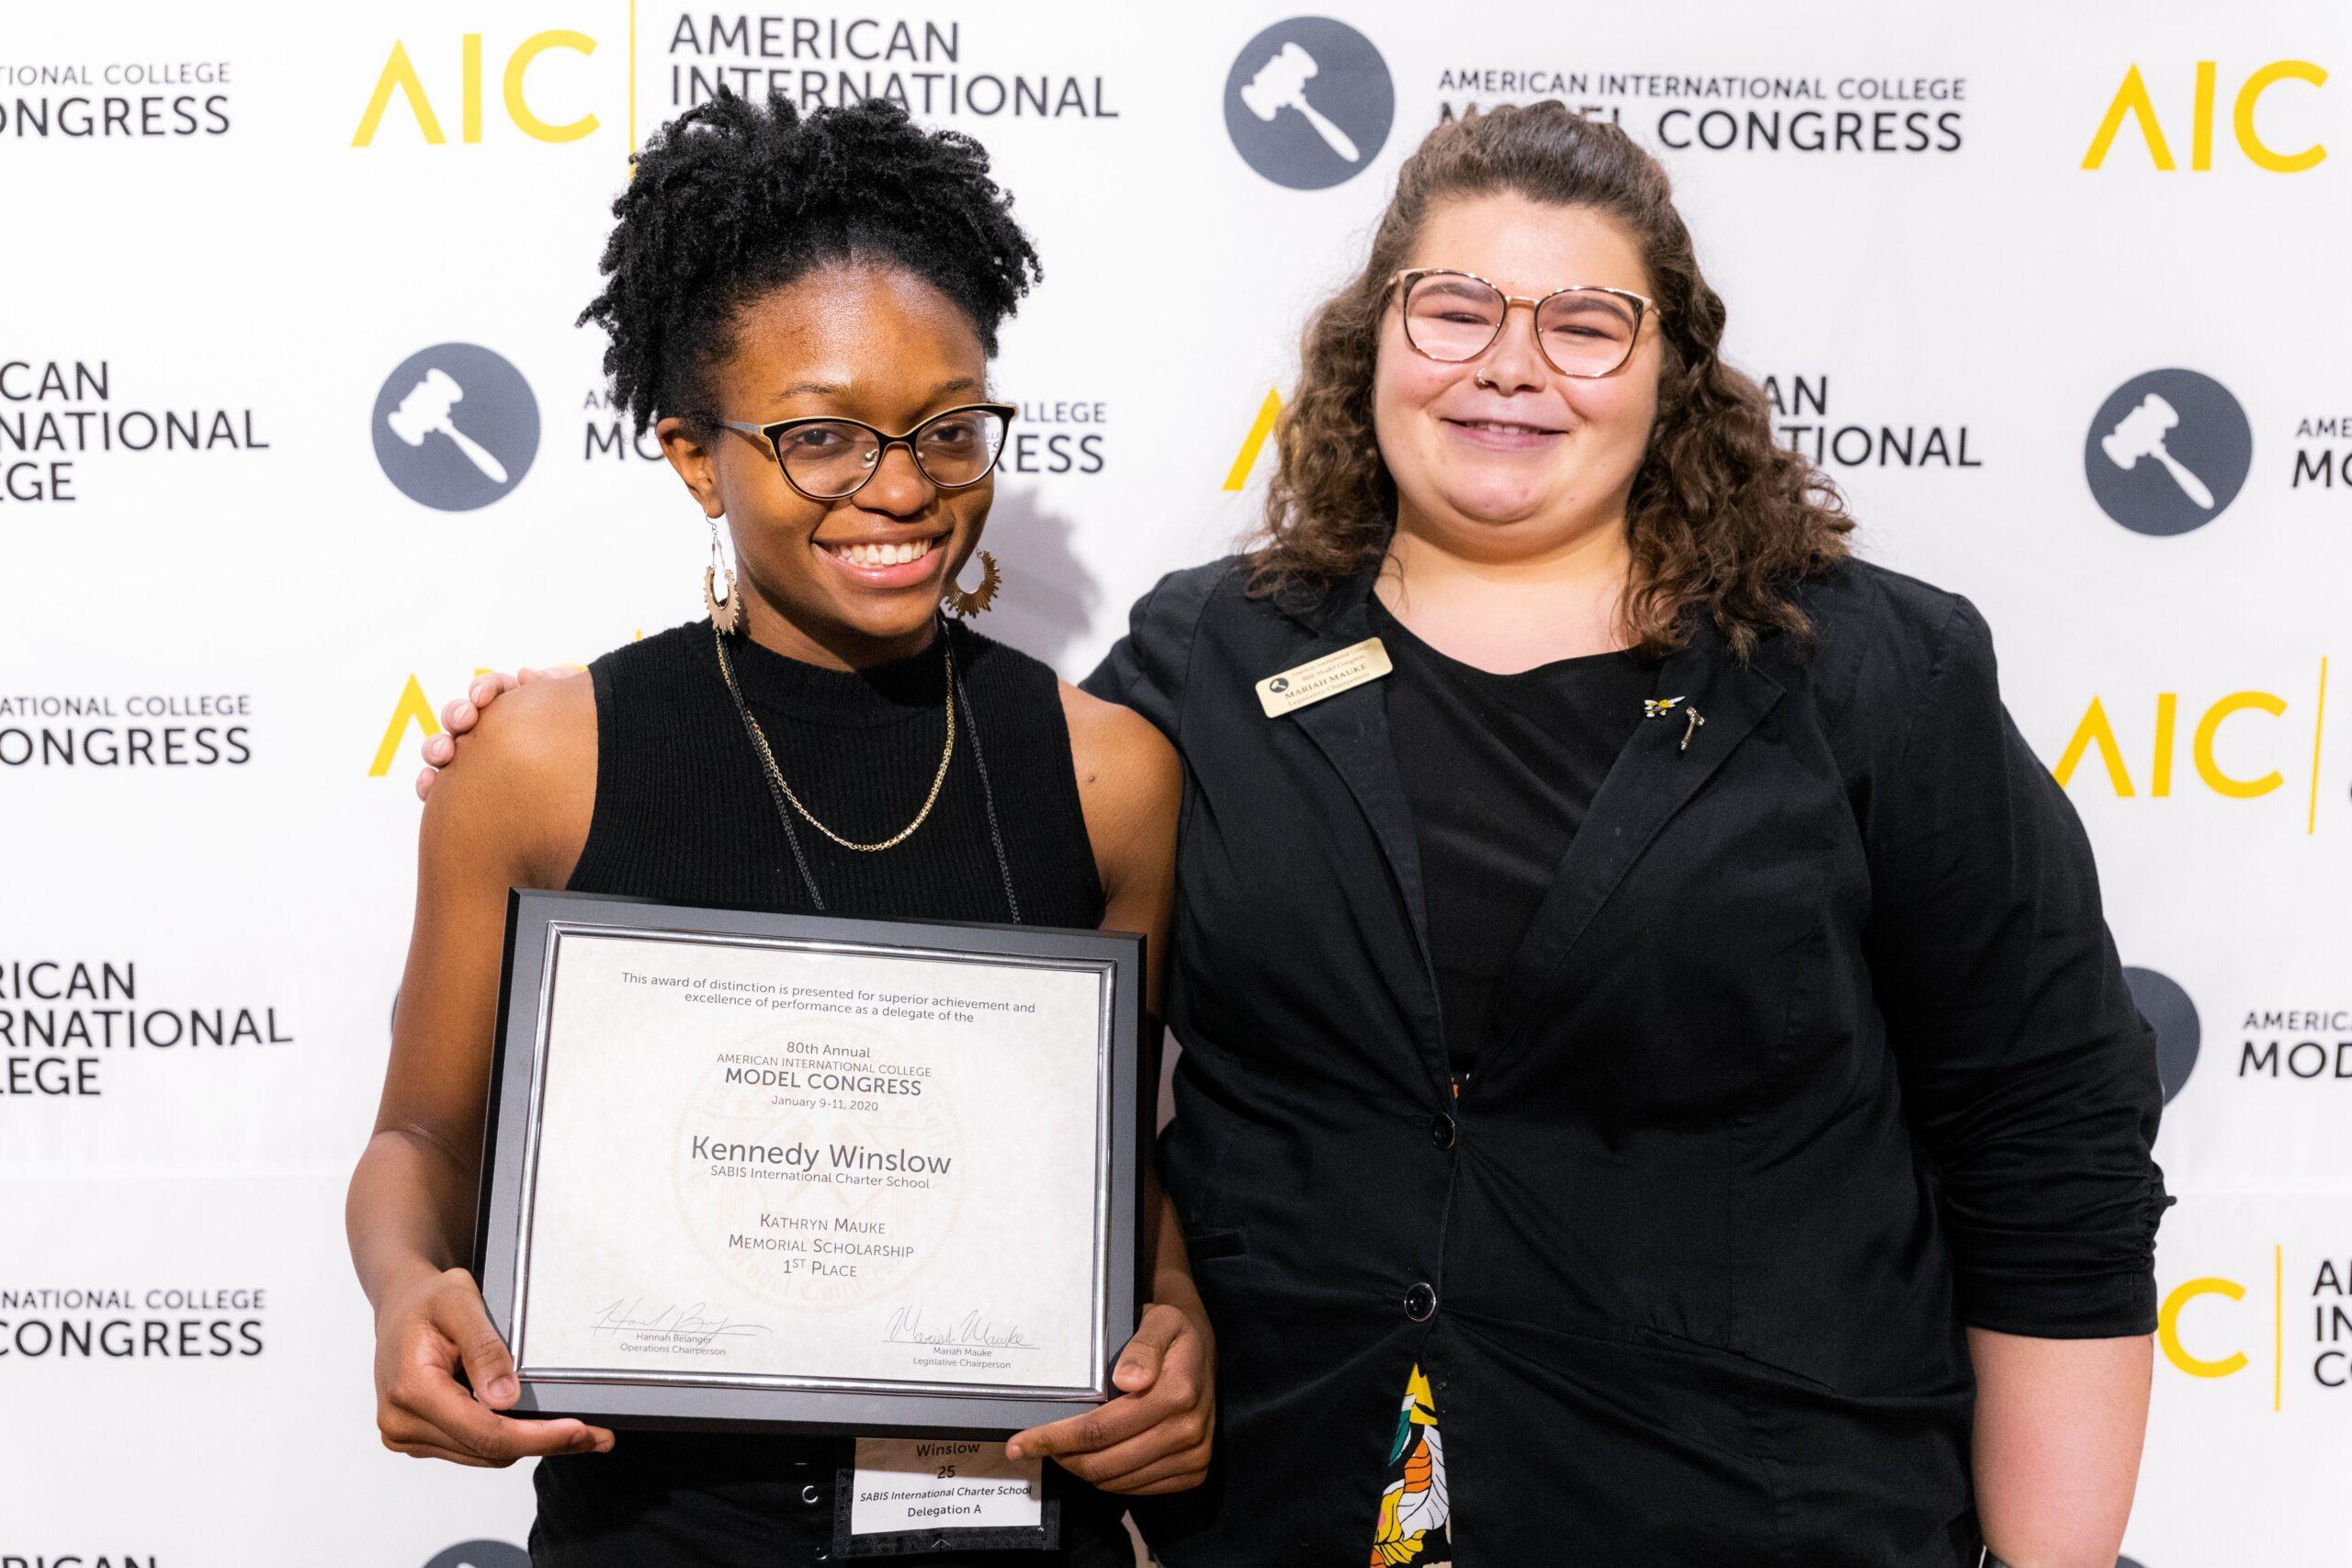 Kathryn Mauke Scholarship Winner Kennedy Winslow from SABIS International Charter School with Model Congress 2020 Legislative Chair Mariah Mauke